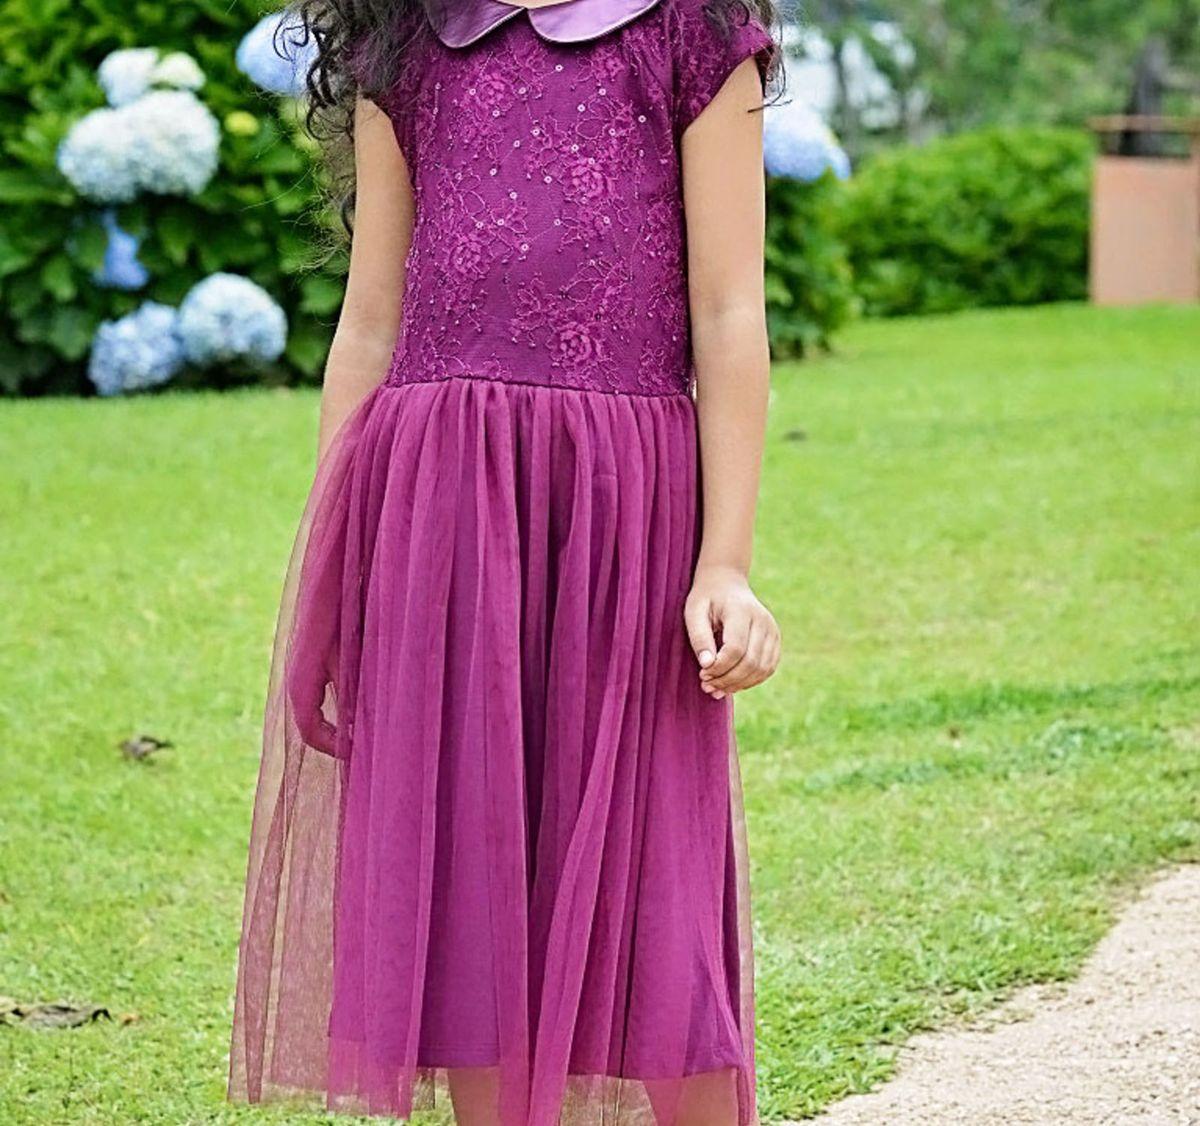 c21f3fc28 vestido longo - menina next uk.  Czm6ly9wag90b3muzw5qb2vplmnvbs5ici9wcm9kdwn0cy8xmdq1njy0ns81ztzlzgrlodnmnjcynjjmowjhztmynzrhndvizgqzmy5qcgc  ...